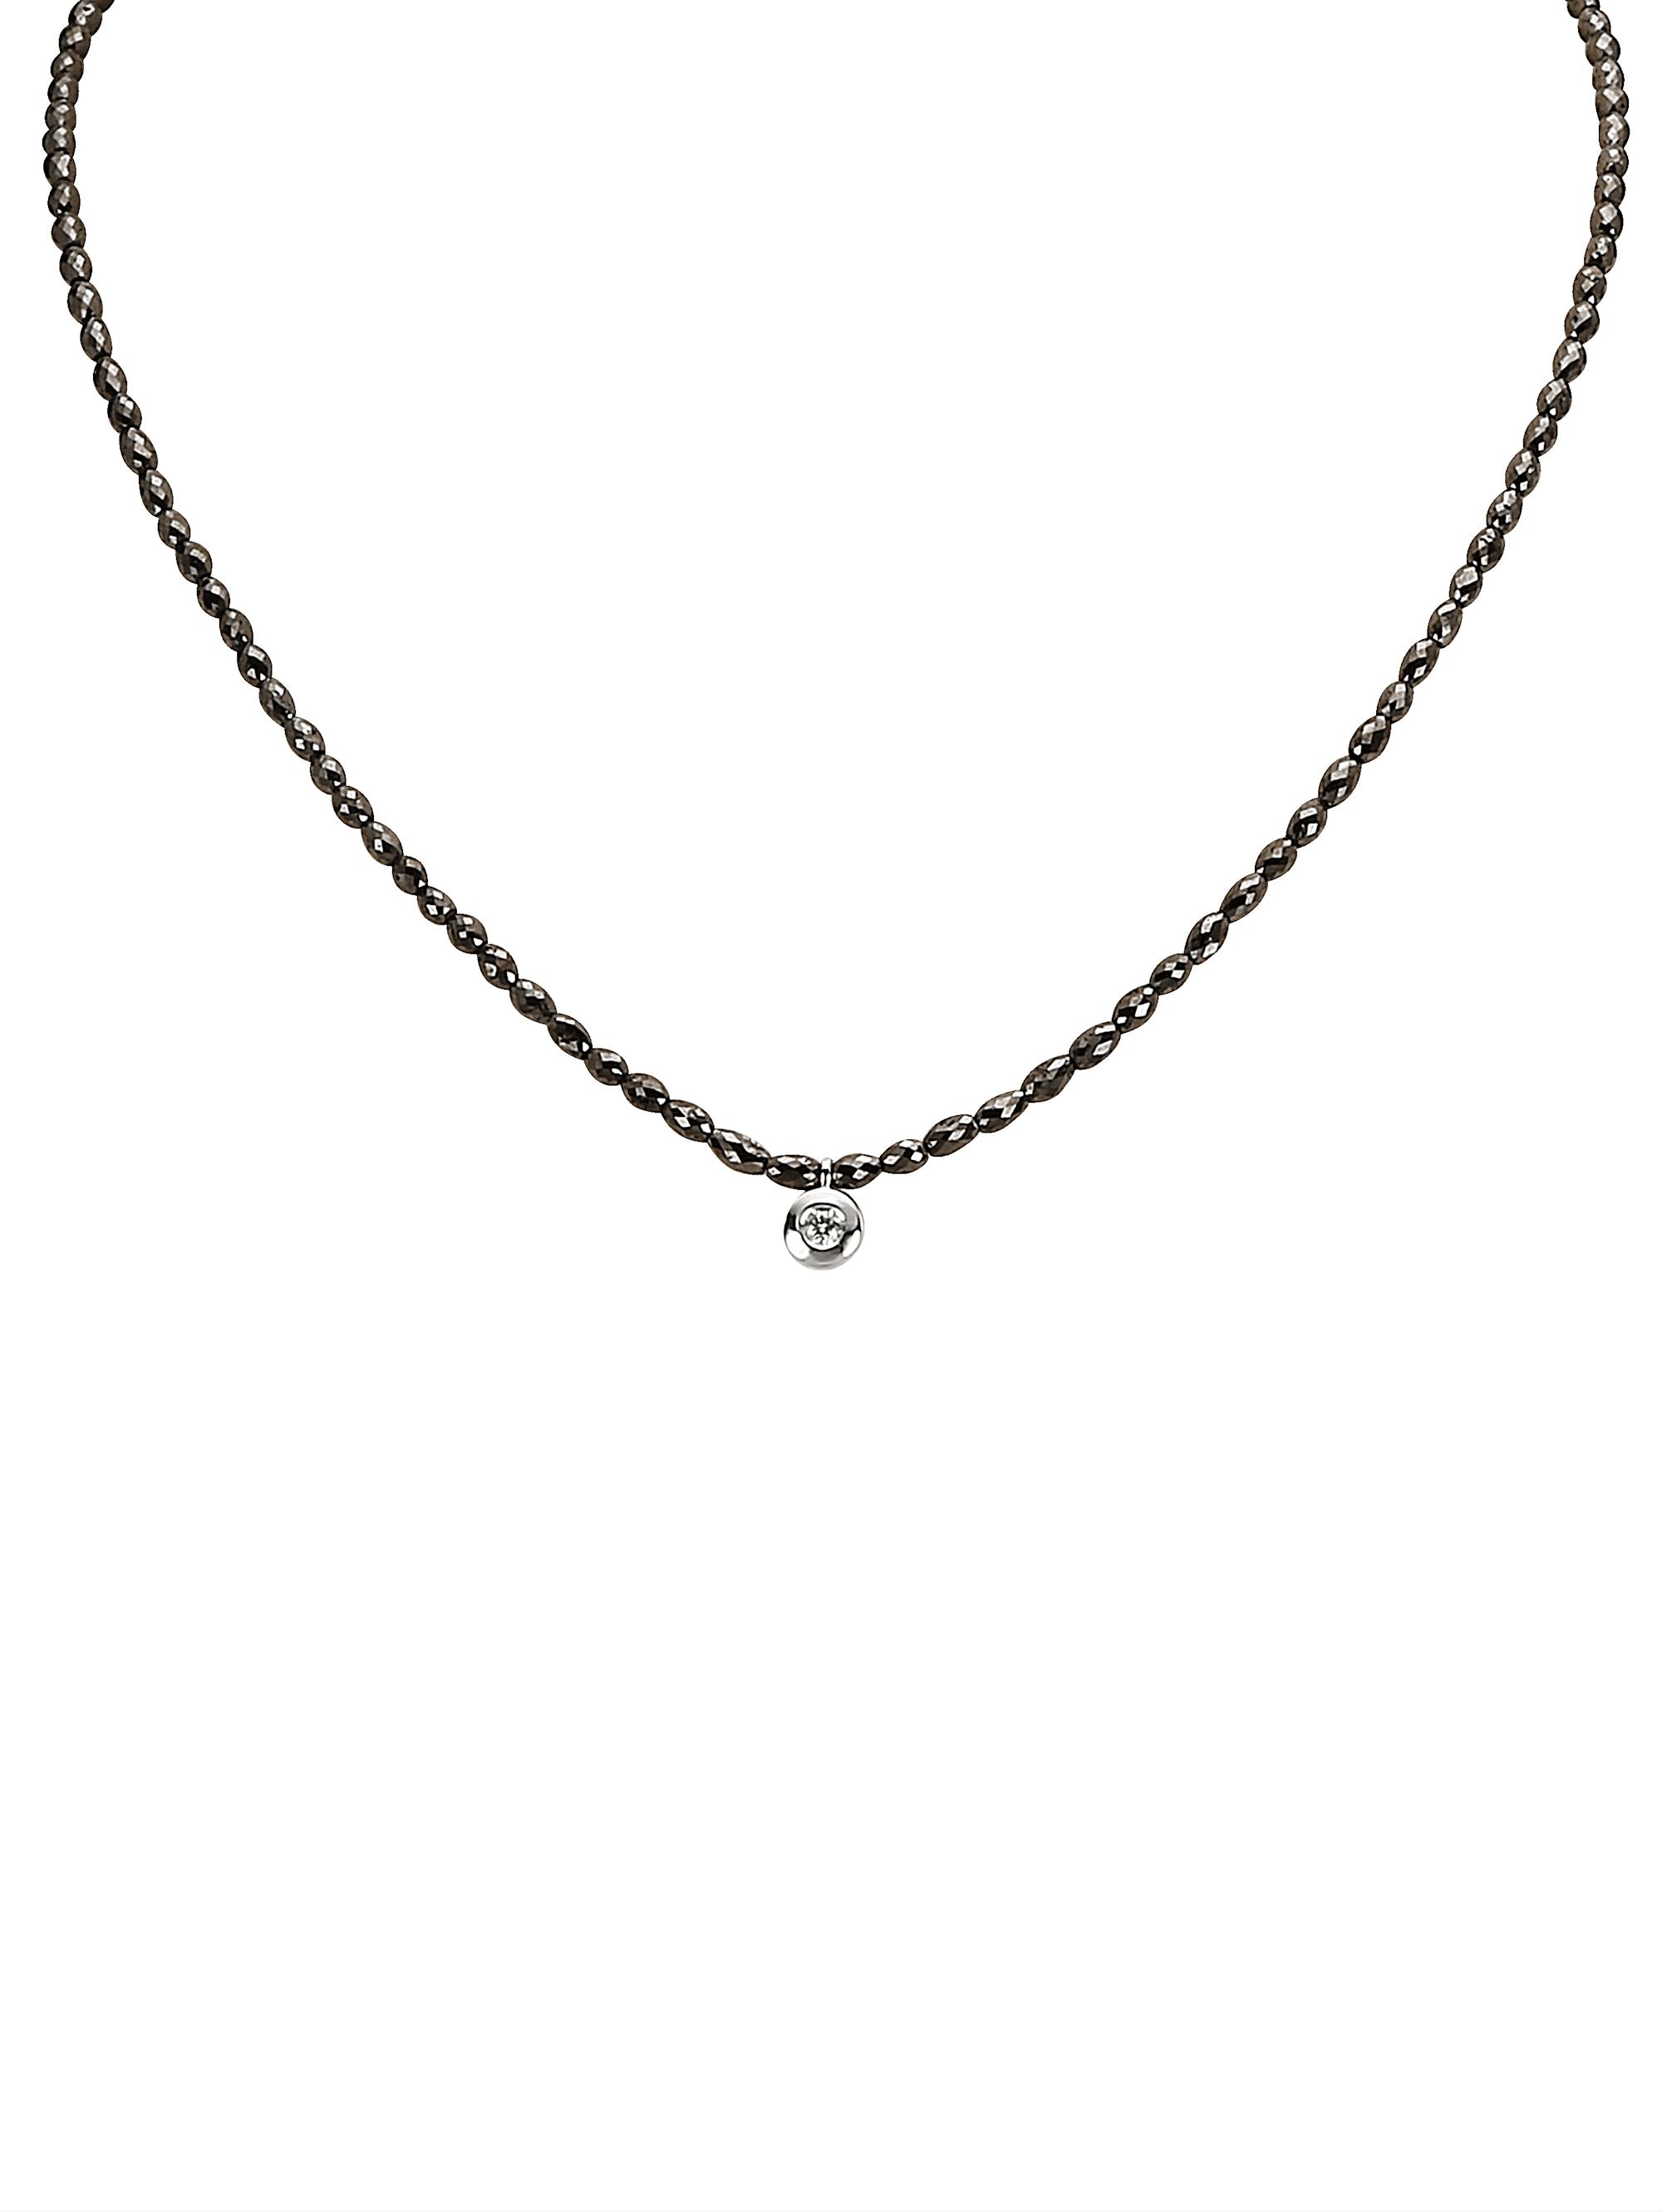 Diemer Diamant Collier mit schwarzen Diamanten aus schwarzen Diamanten Syvoj